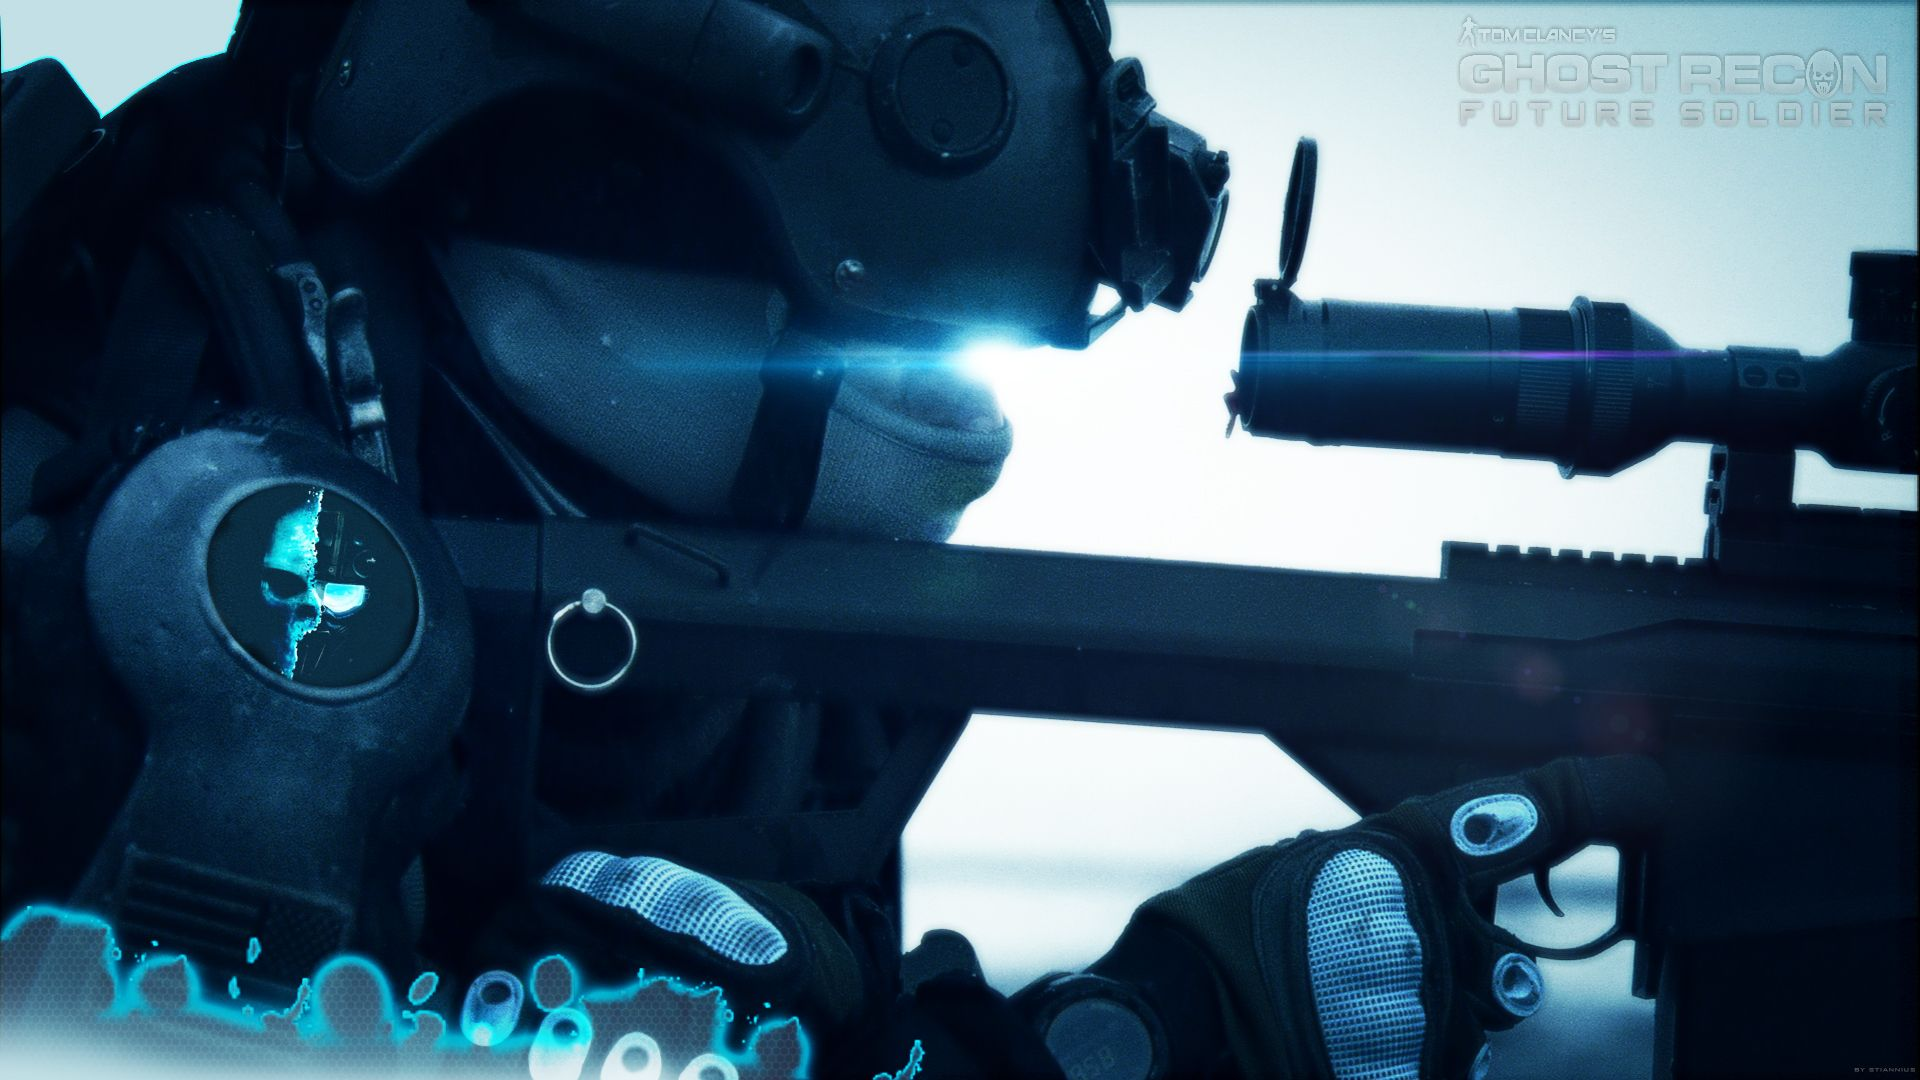 Ghost Recon Future Soldier Wallpaper - WallpaperSafari